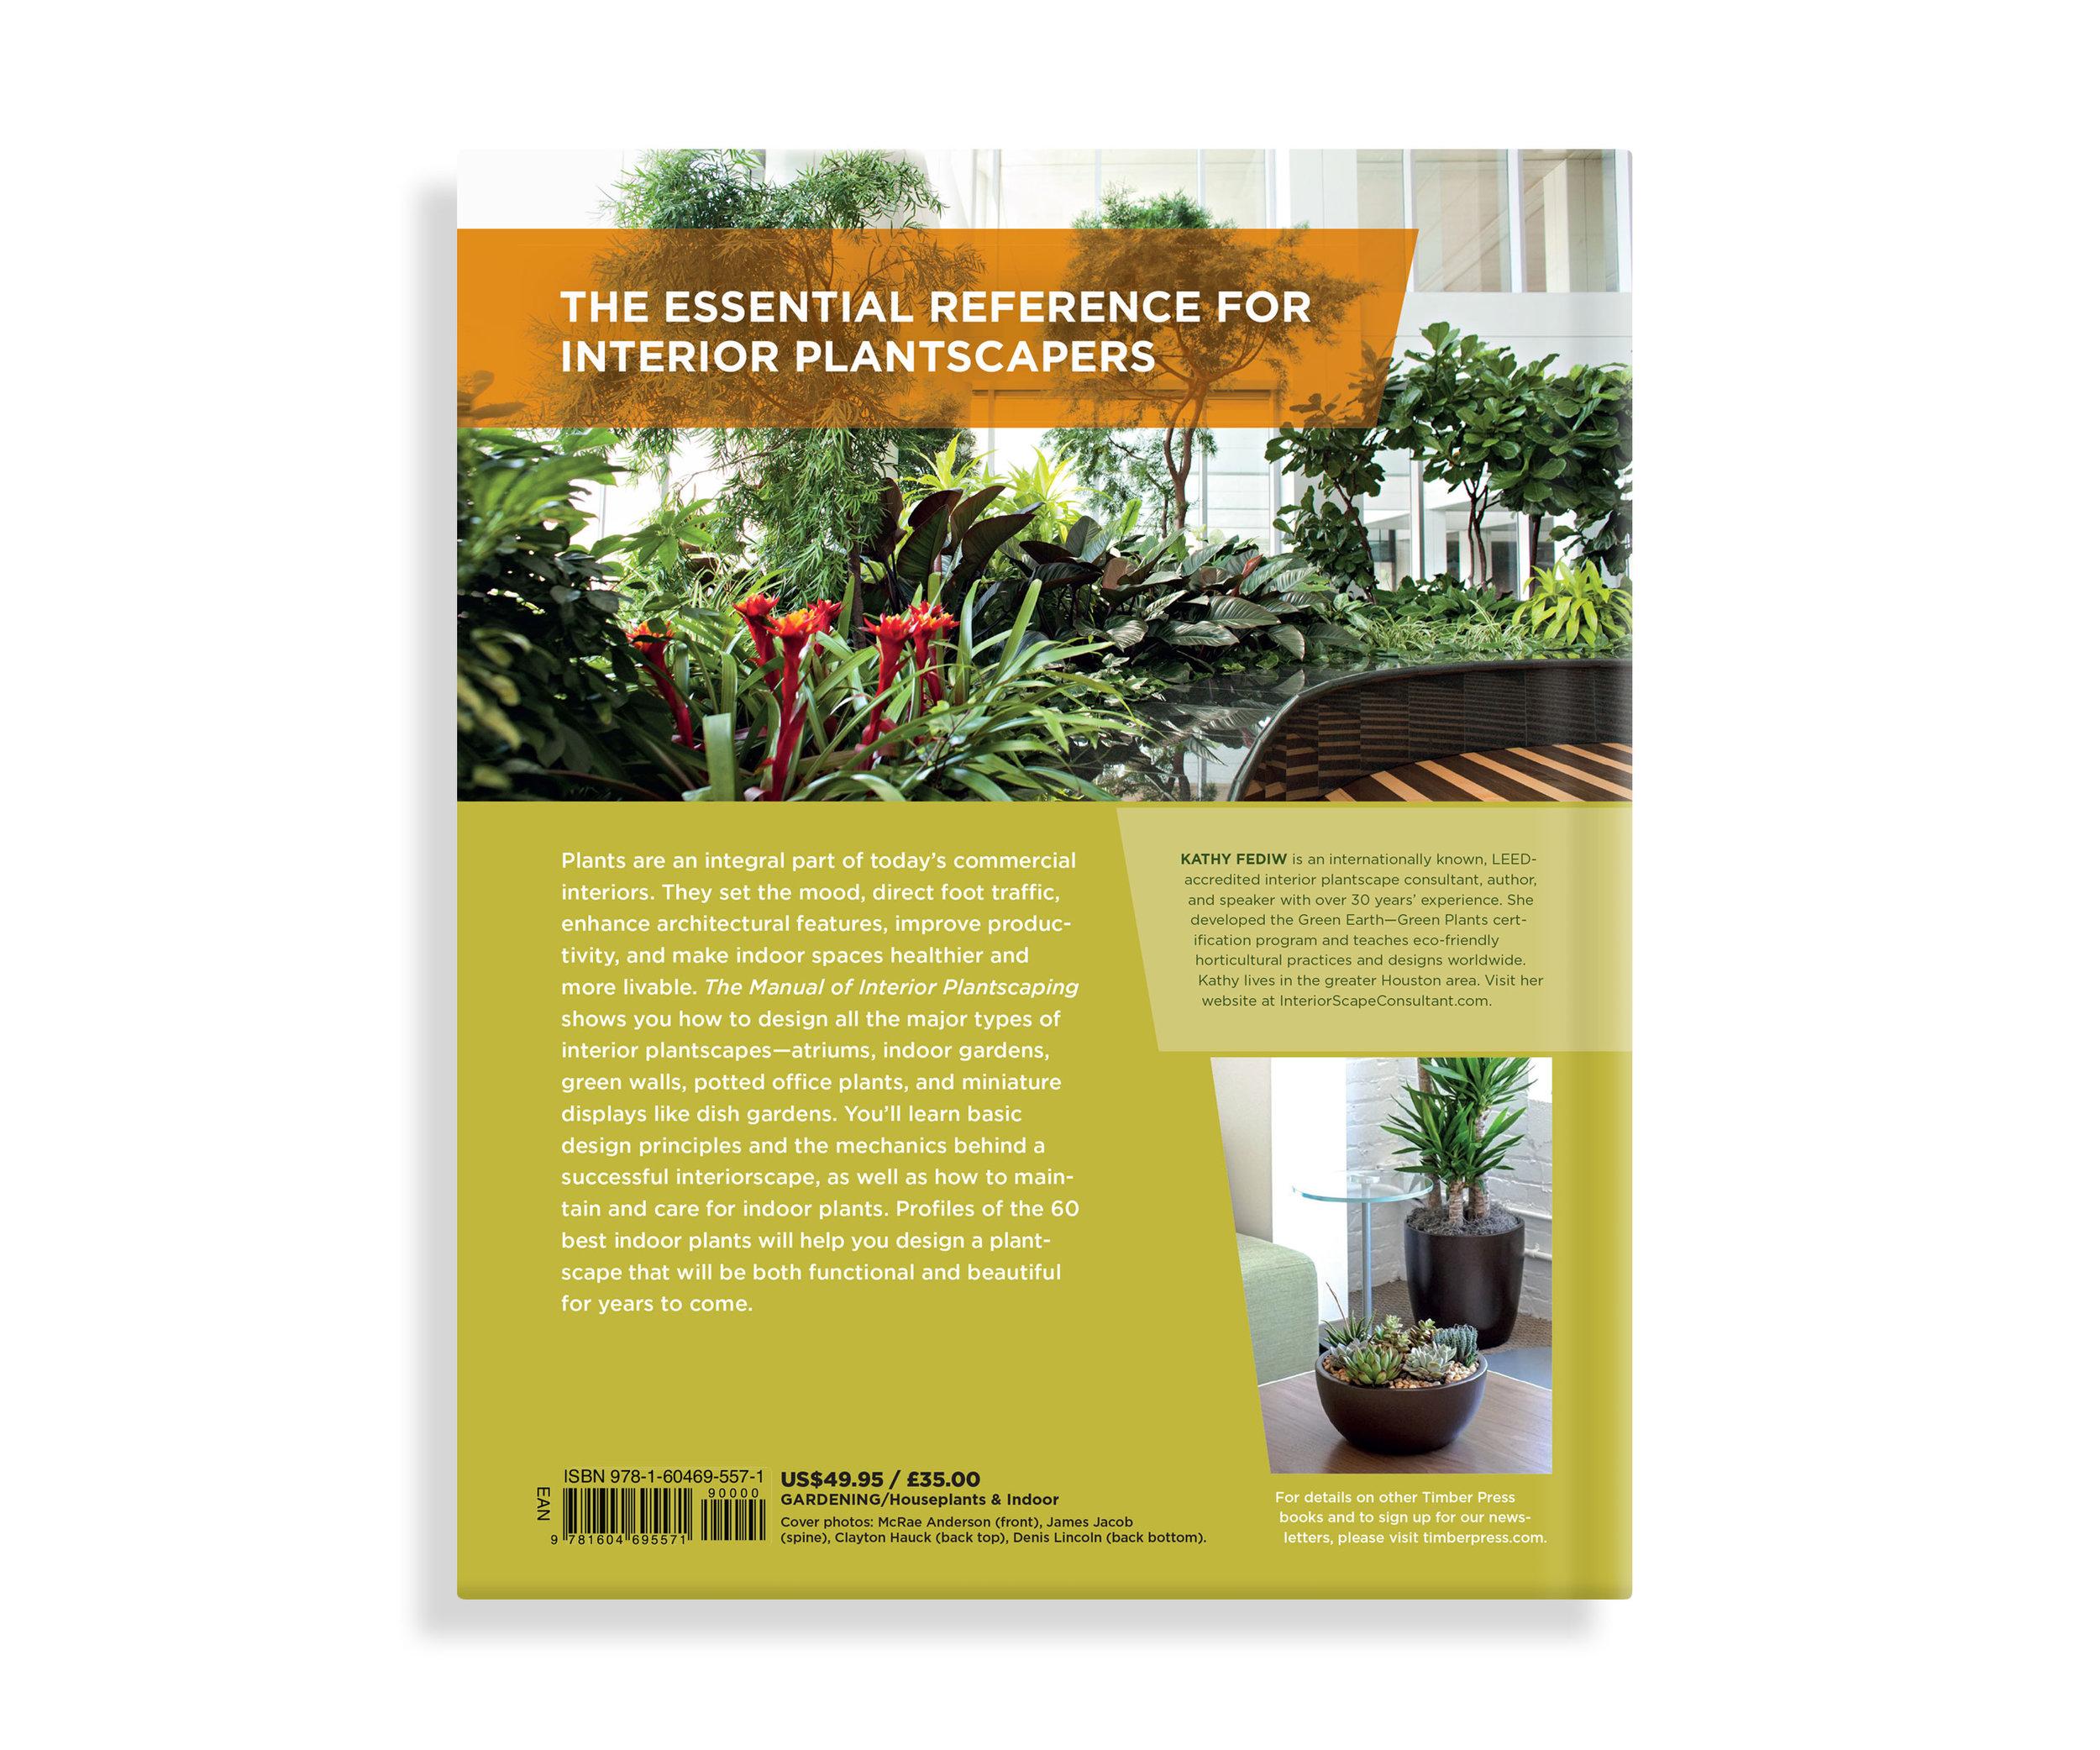 book_interiorplantscaping_cover_003.jpg